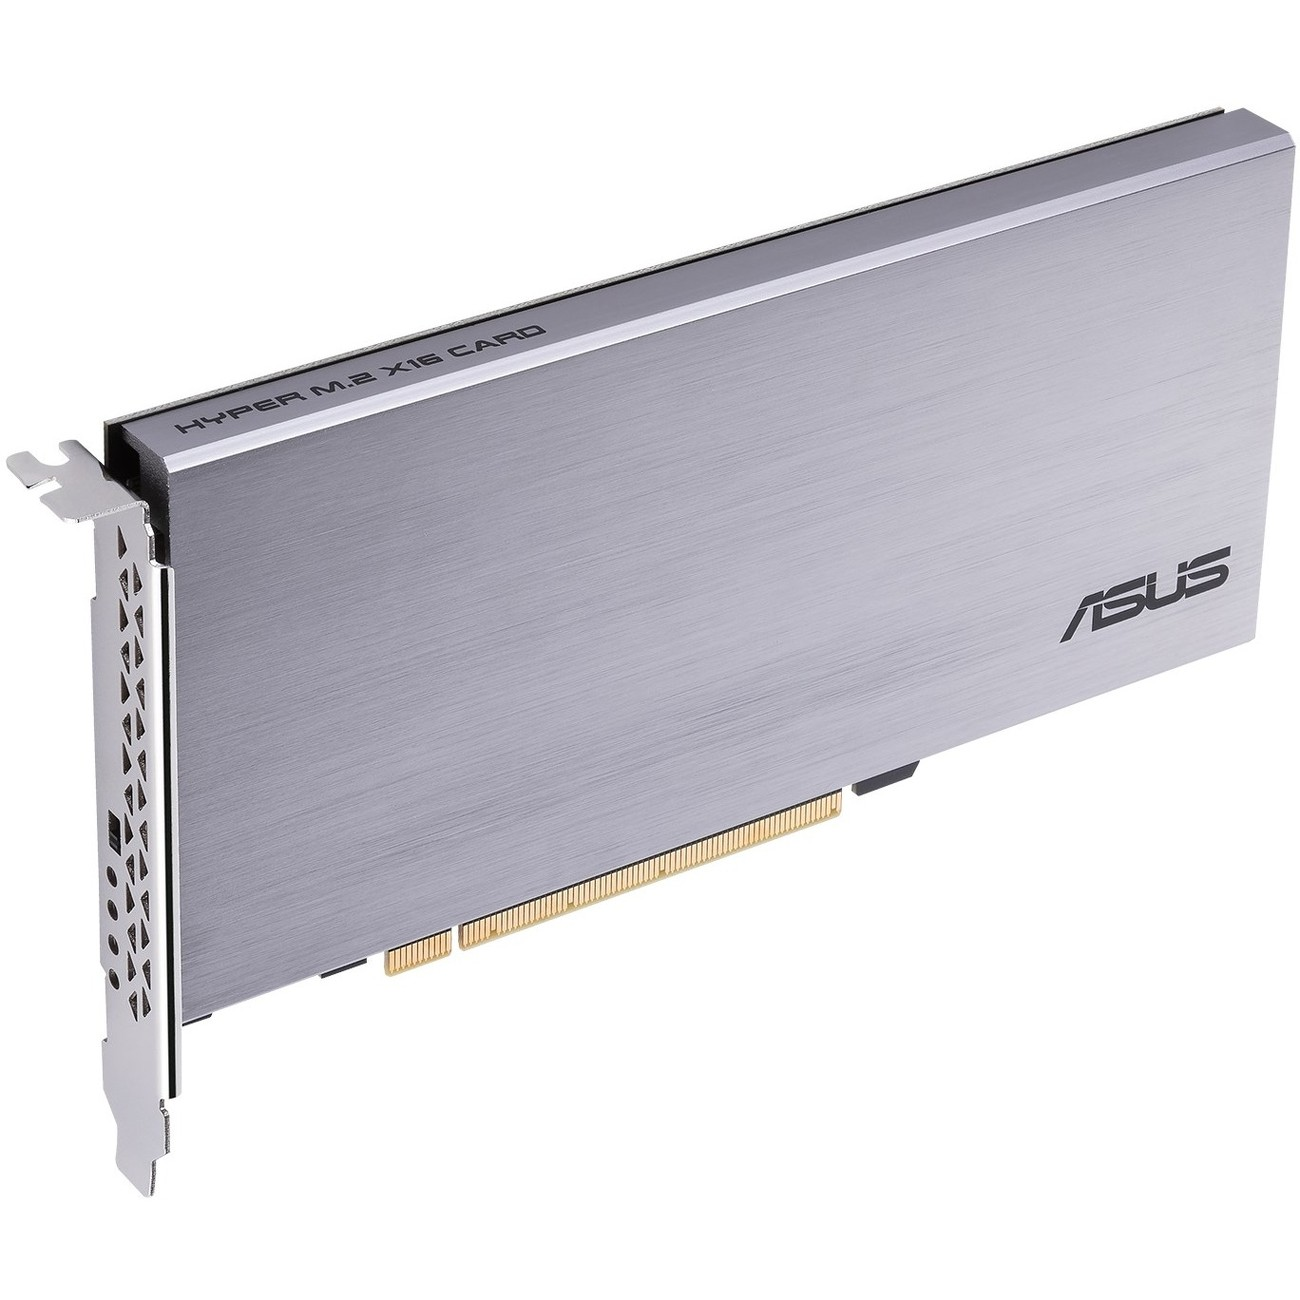 Asus Hyper Expansion Card M 2 PCIe x16